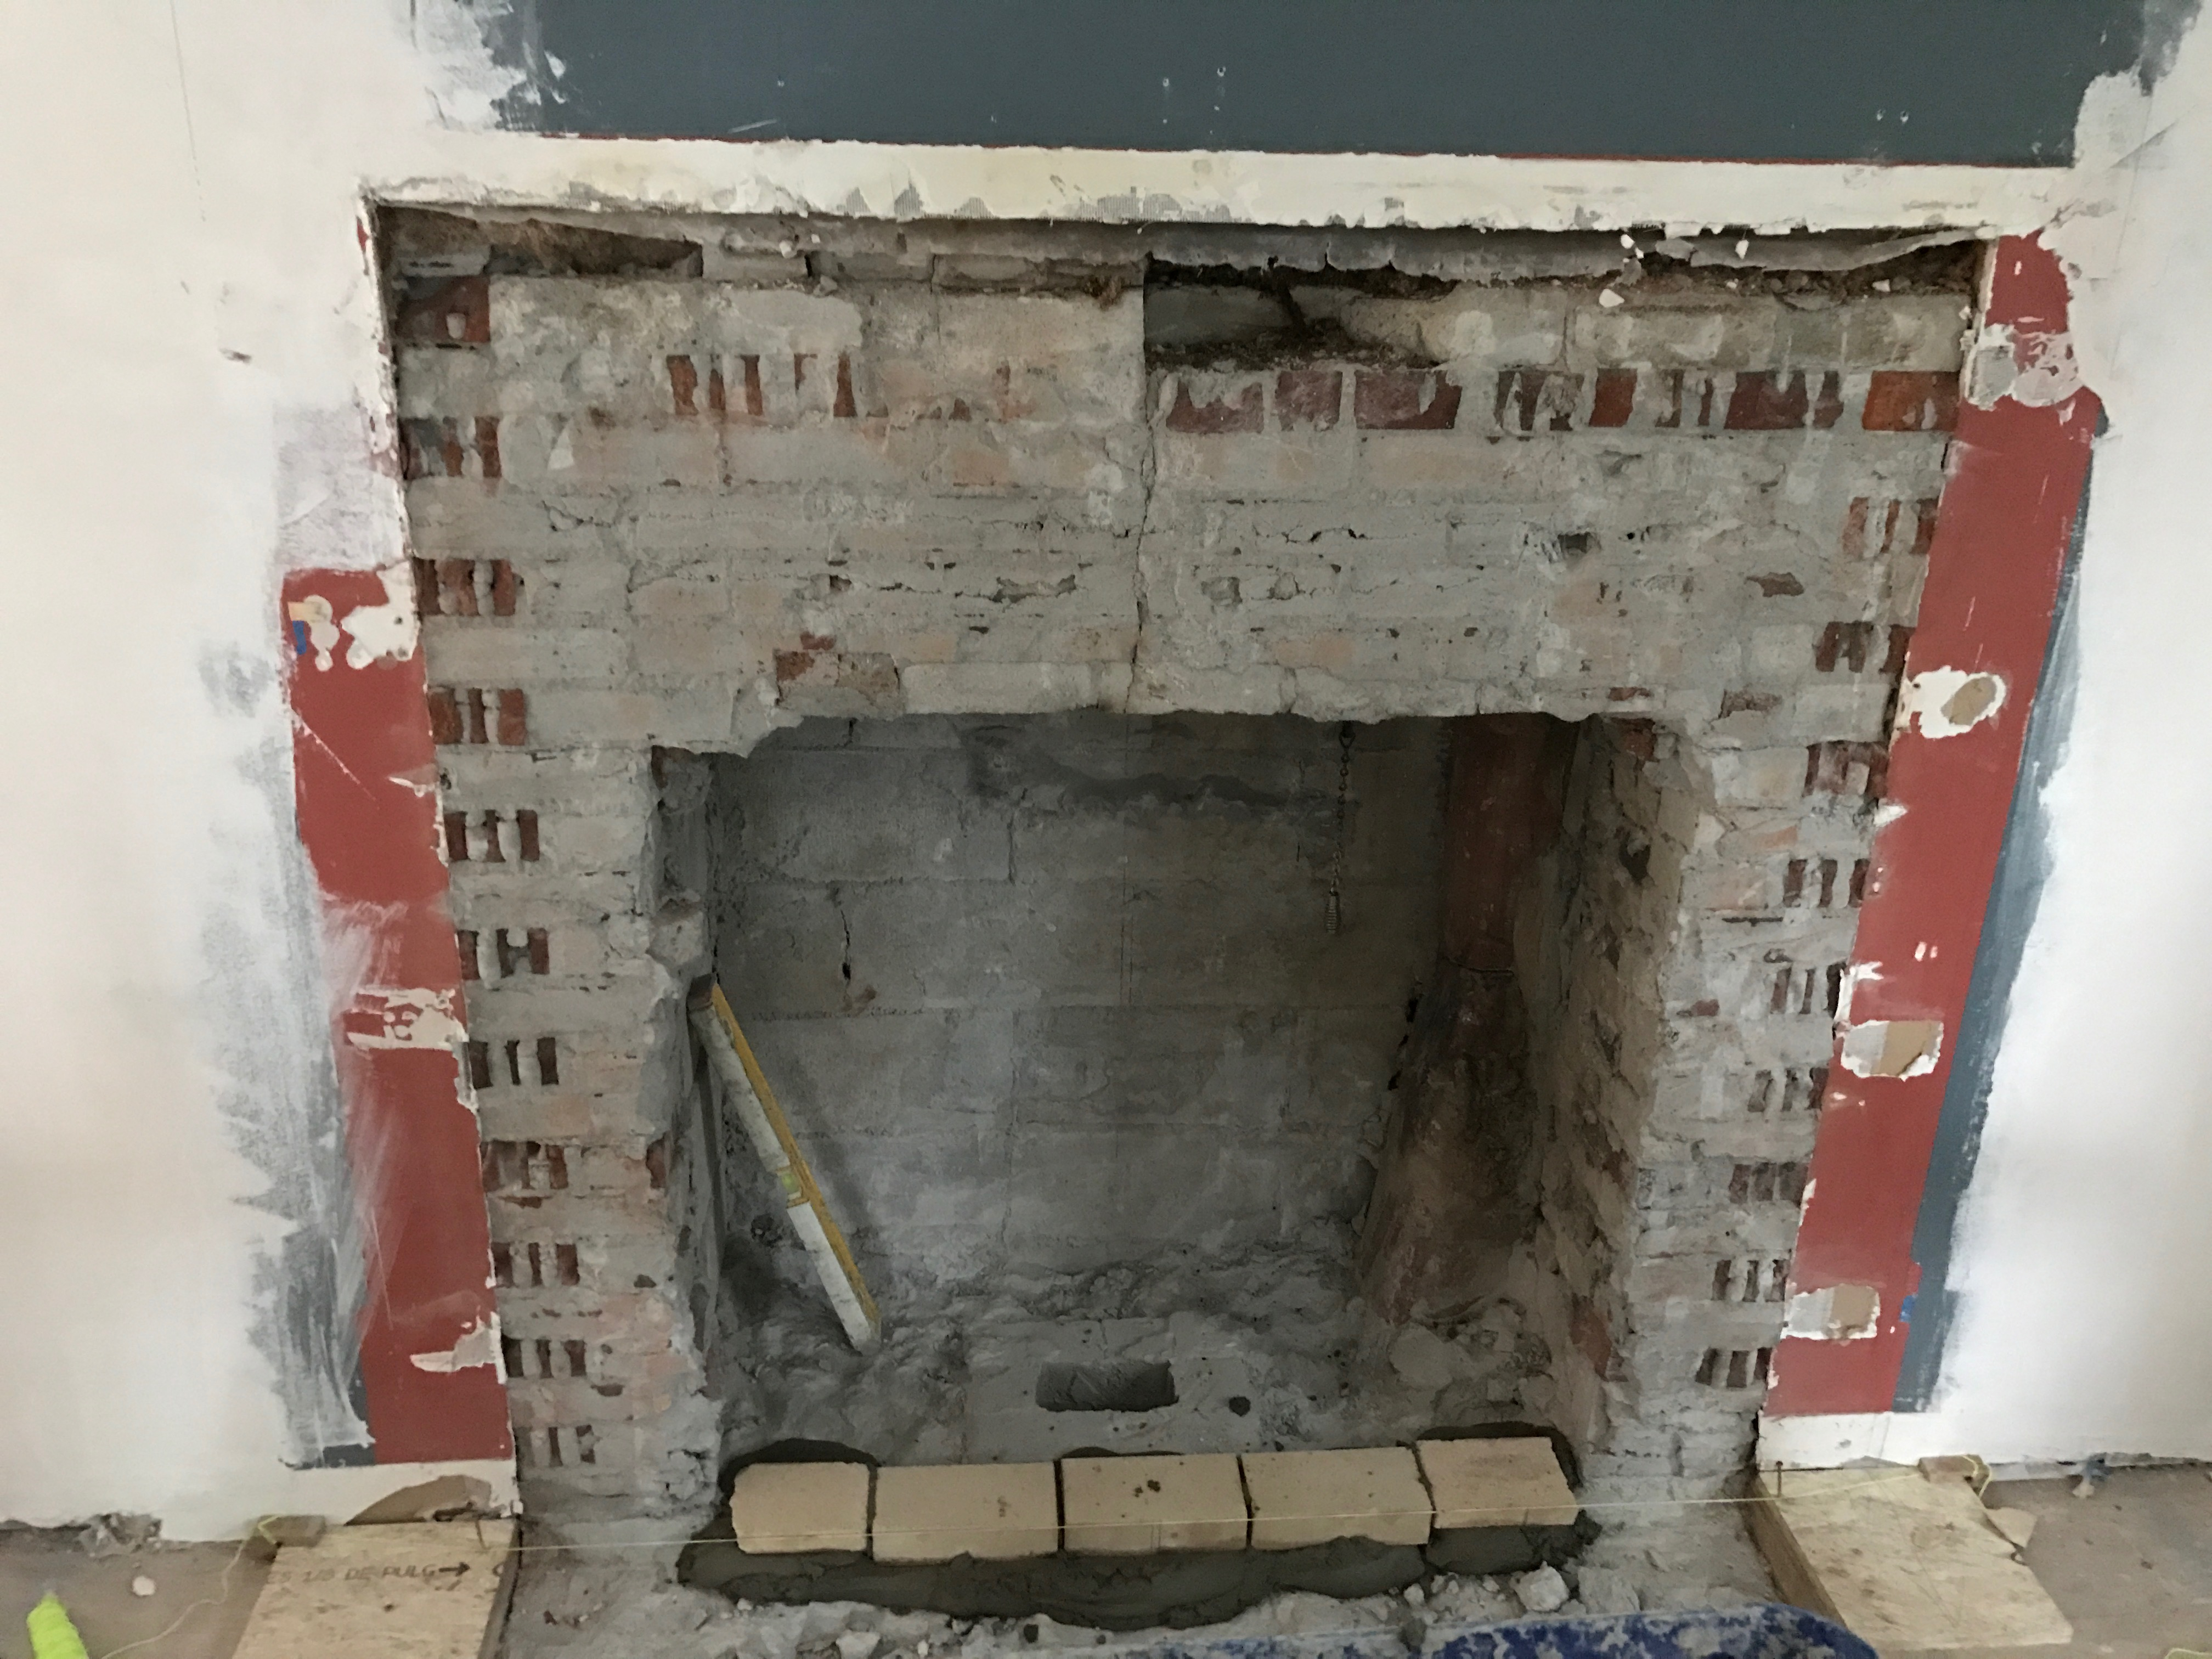 Re laying a firebox-4e37bcd3-bdd2-4184-b203-0e0de63b06e6.jpg